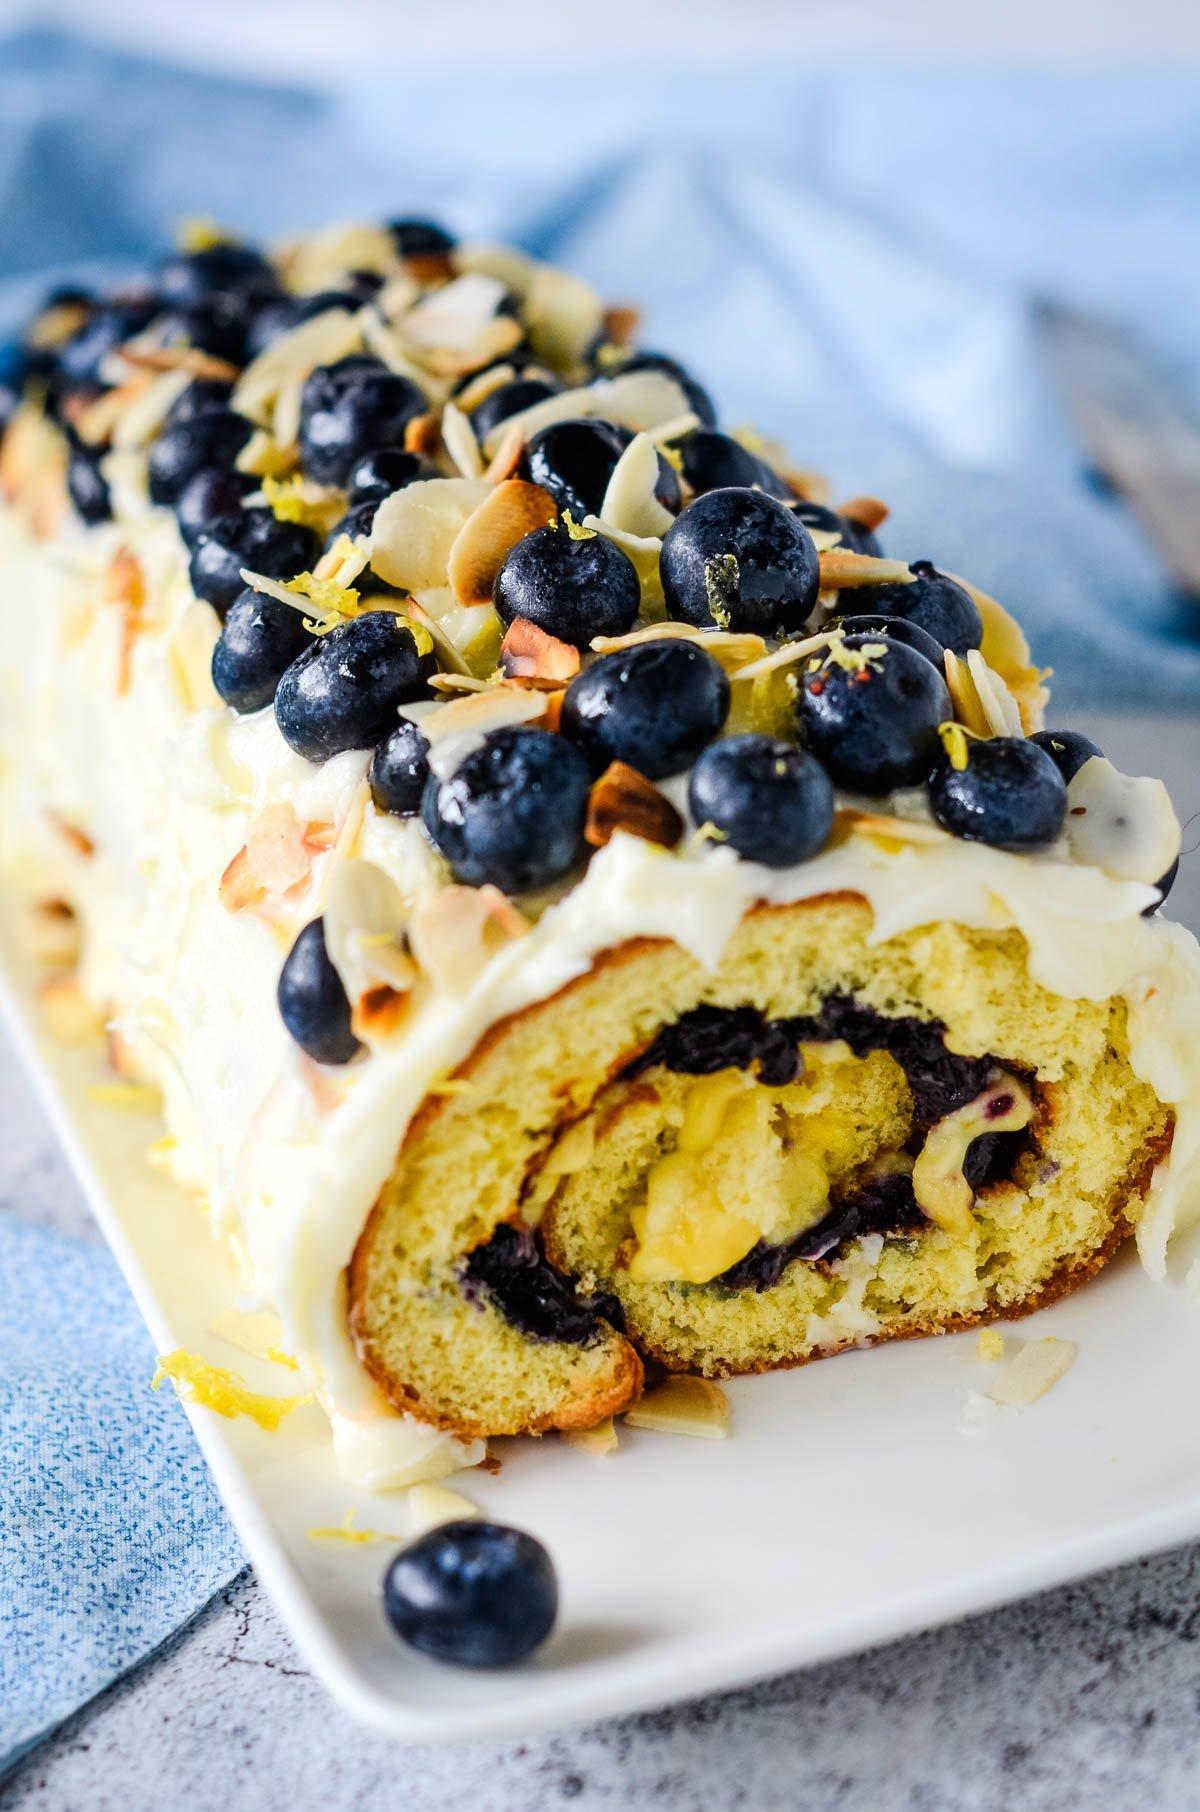 blueberry and lemon roulade